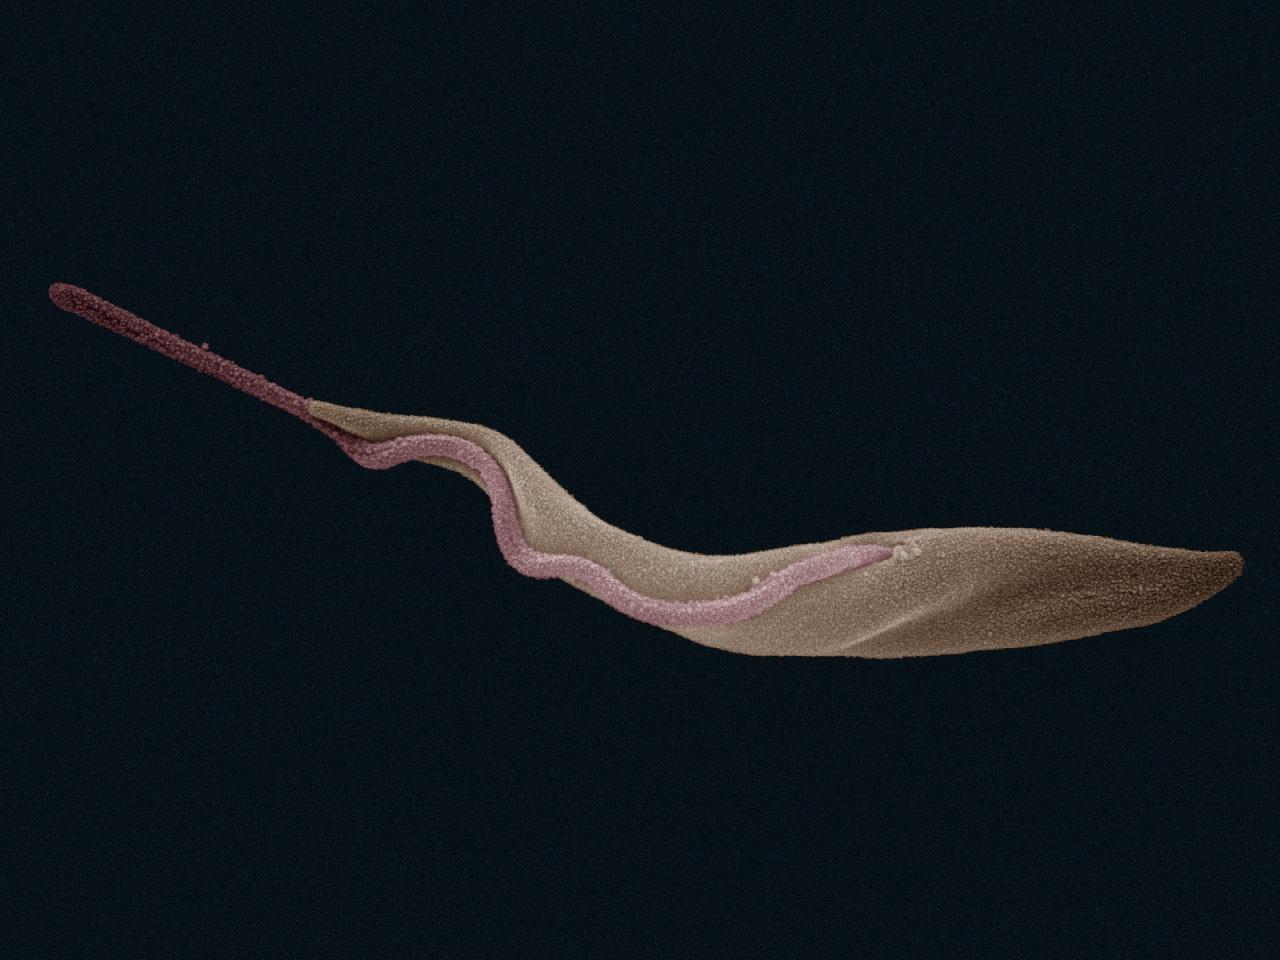 TrypanosomaBrucei ProcyclicTrypomastigote SEM.jpg